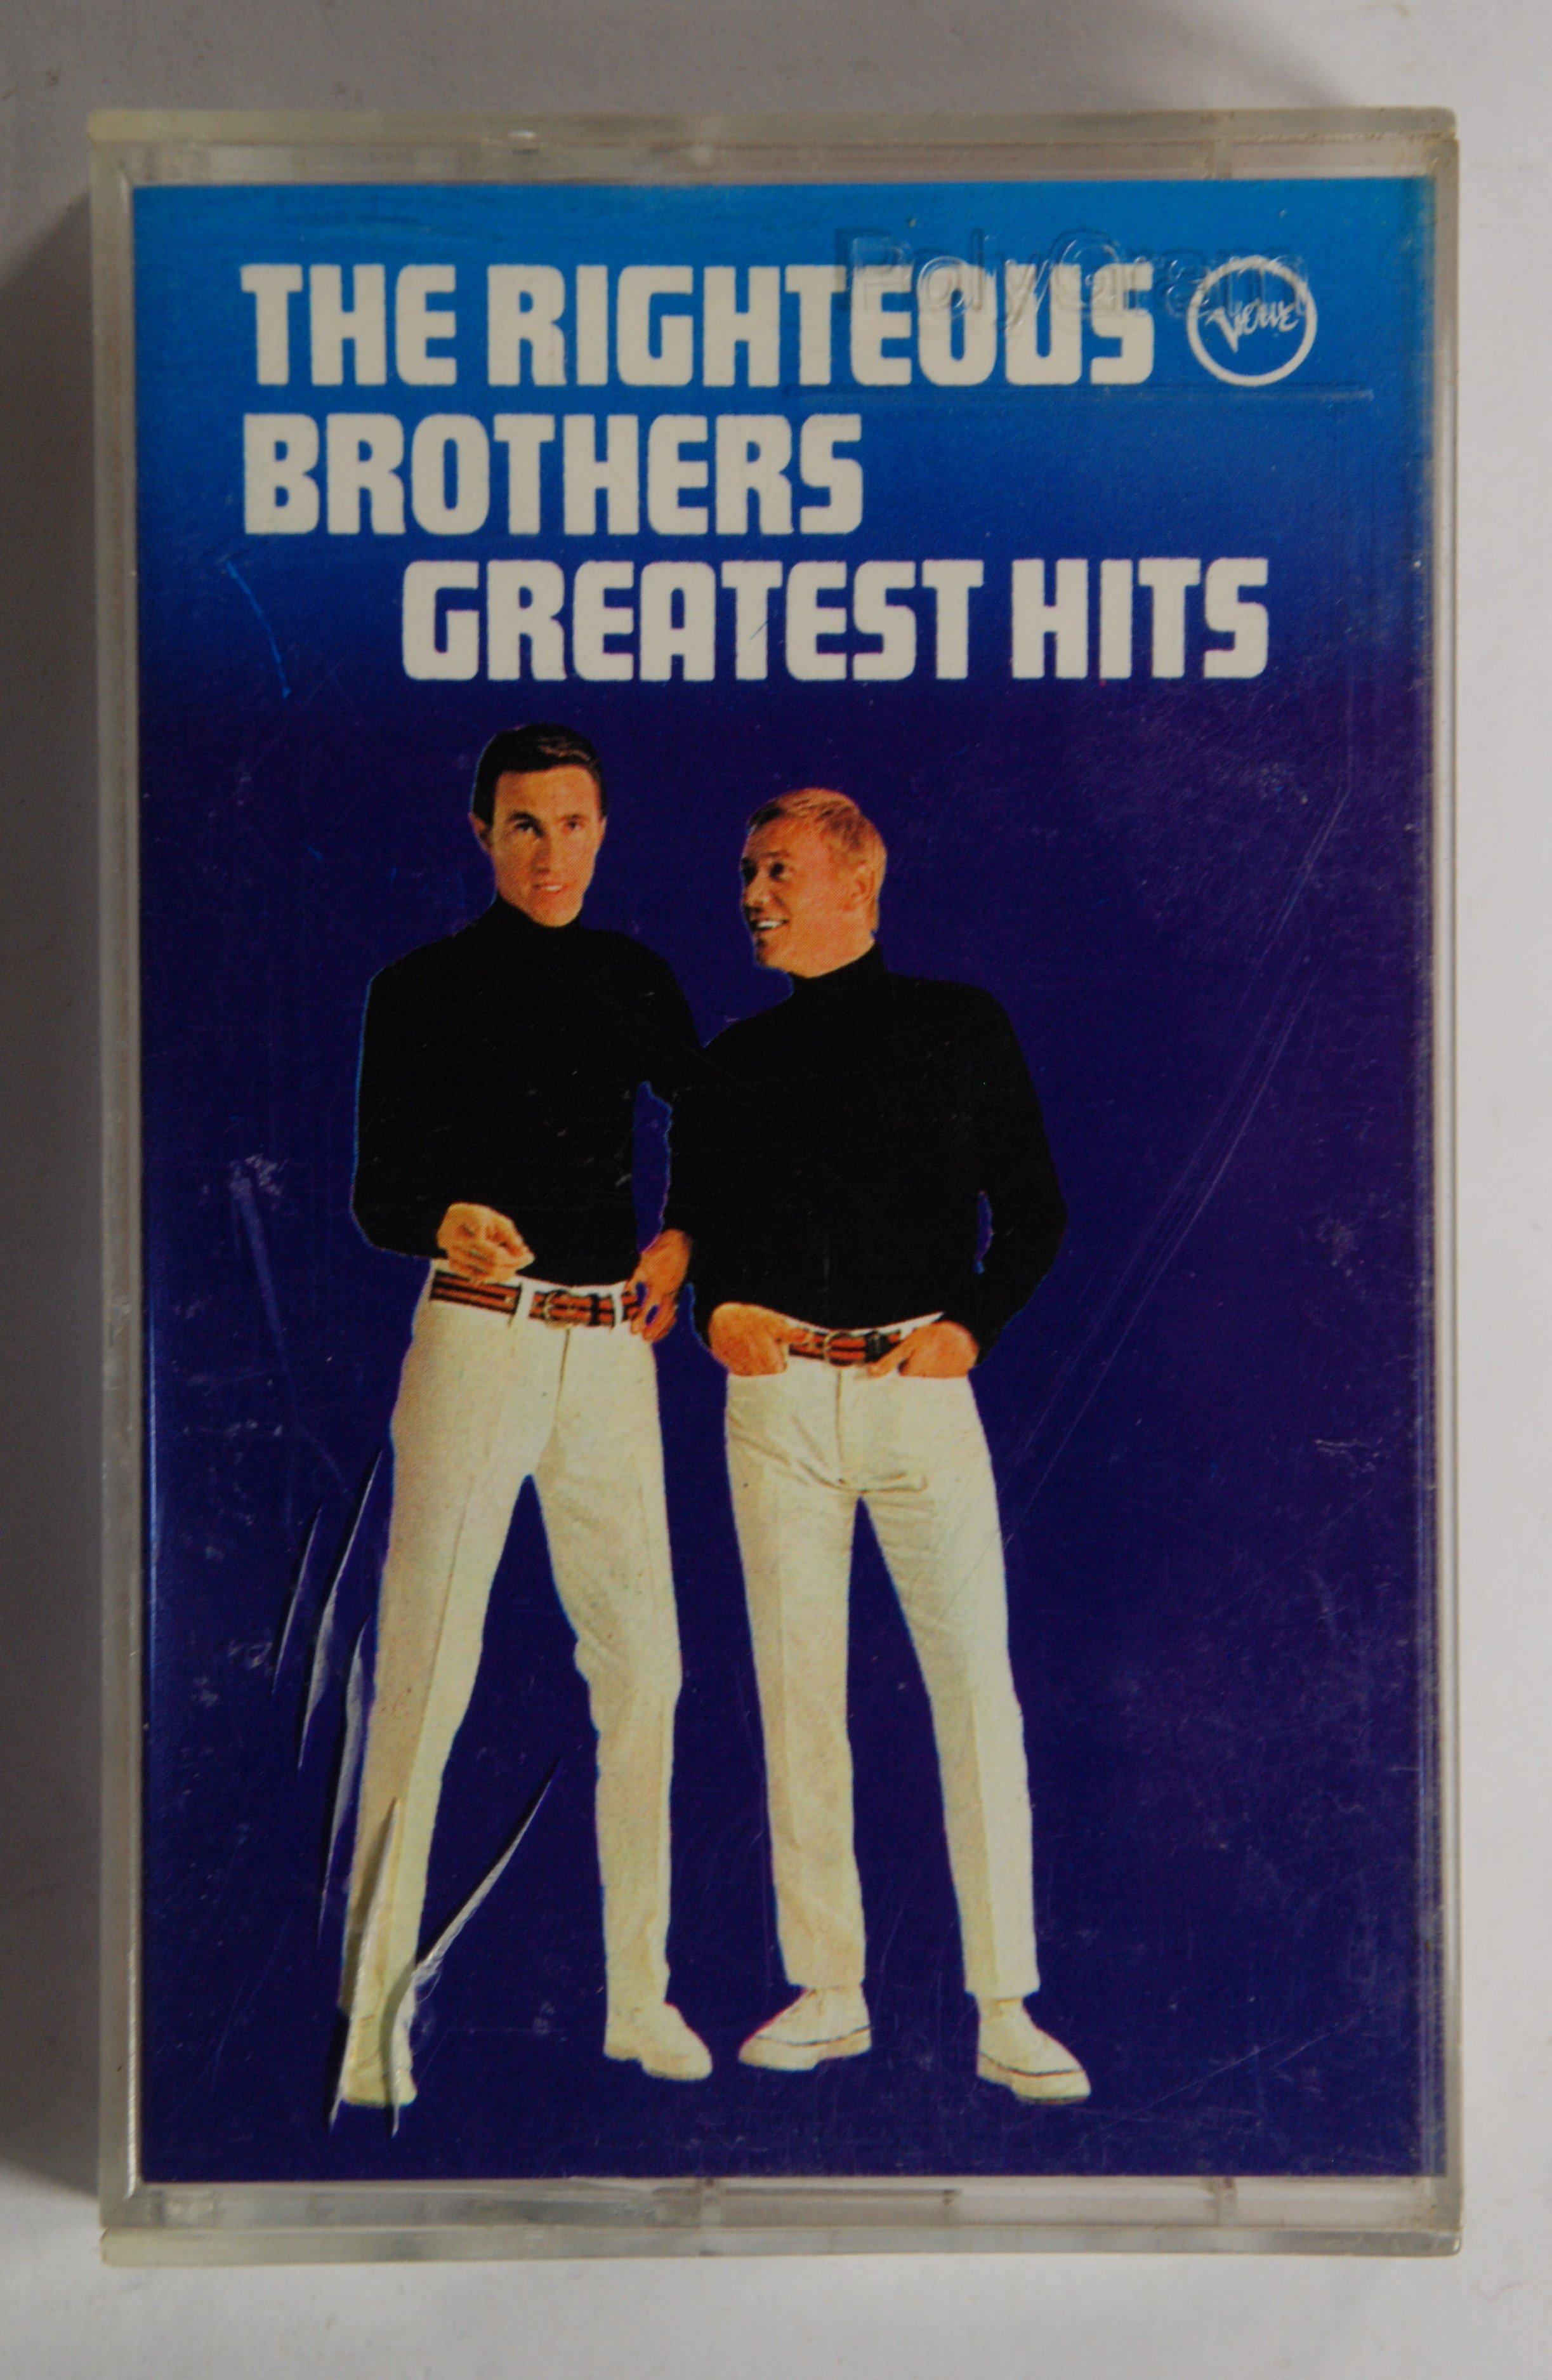 錄音帶 /卡帶/C51/RIGHTEOUS BROTHERS正義兄弟/精選集/UNCHAINED MELODY/非CD非黑膠